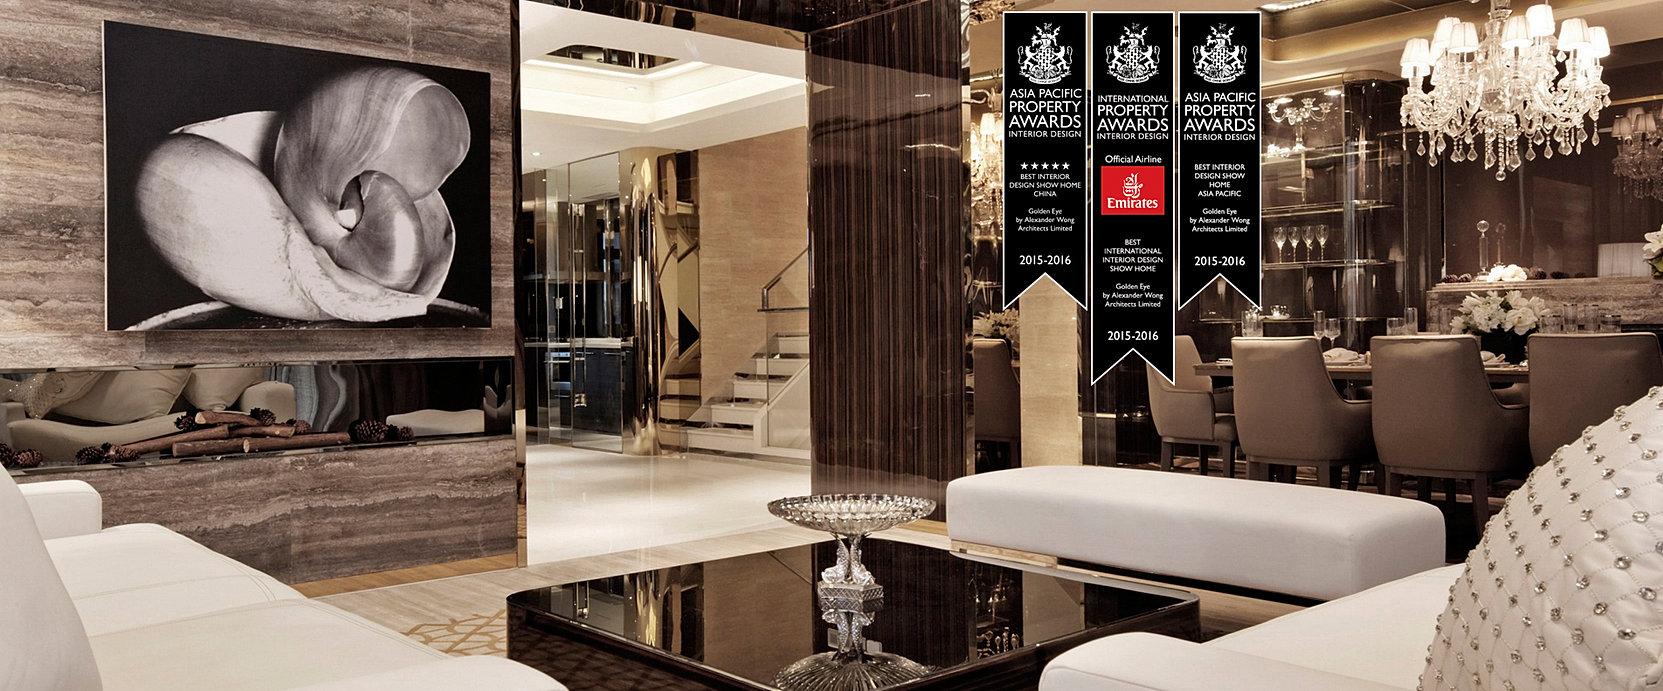 Alexander wong architects awards winning interior design for International interior design companies